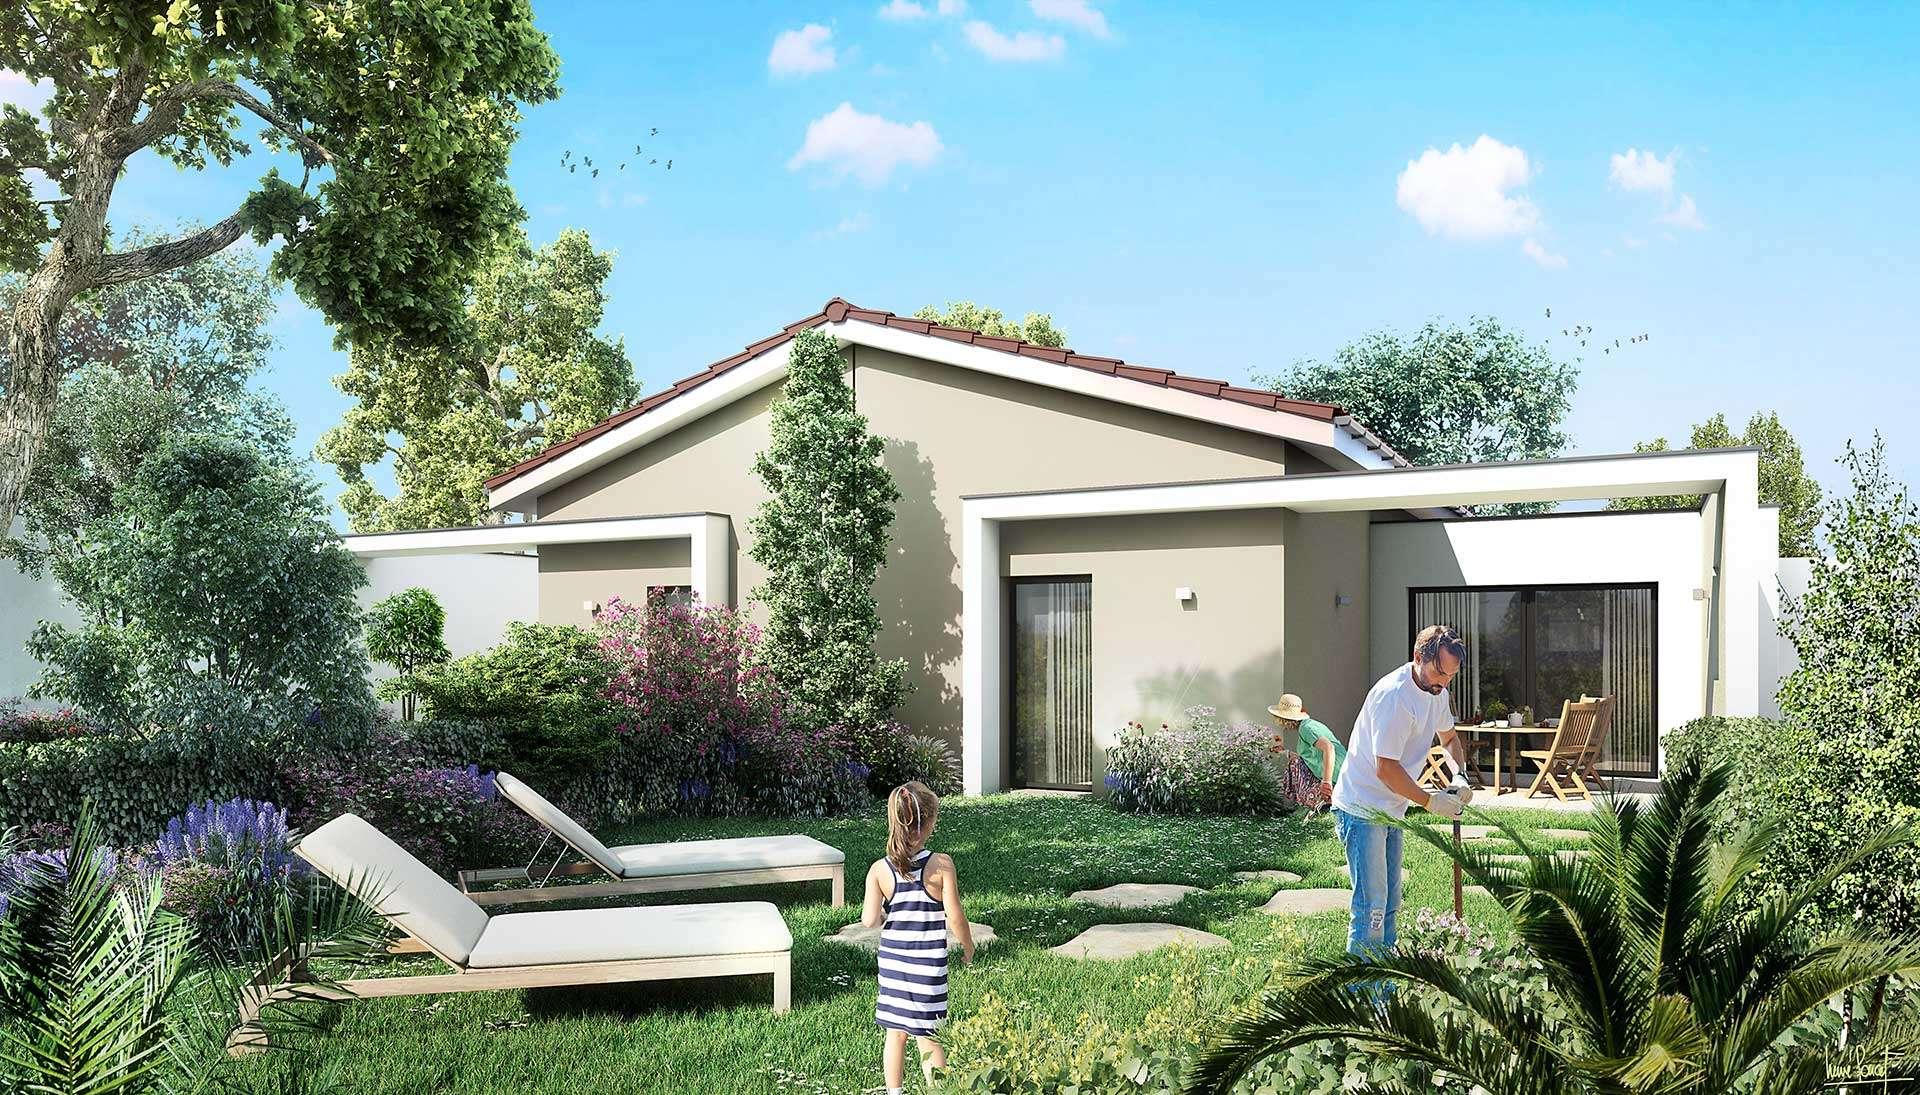 Programme Immobilier Habitat Dauphinois Clos Giray